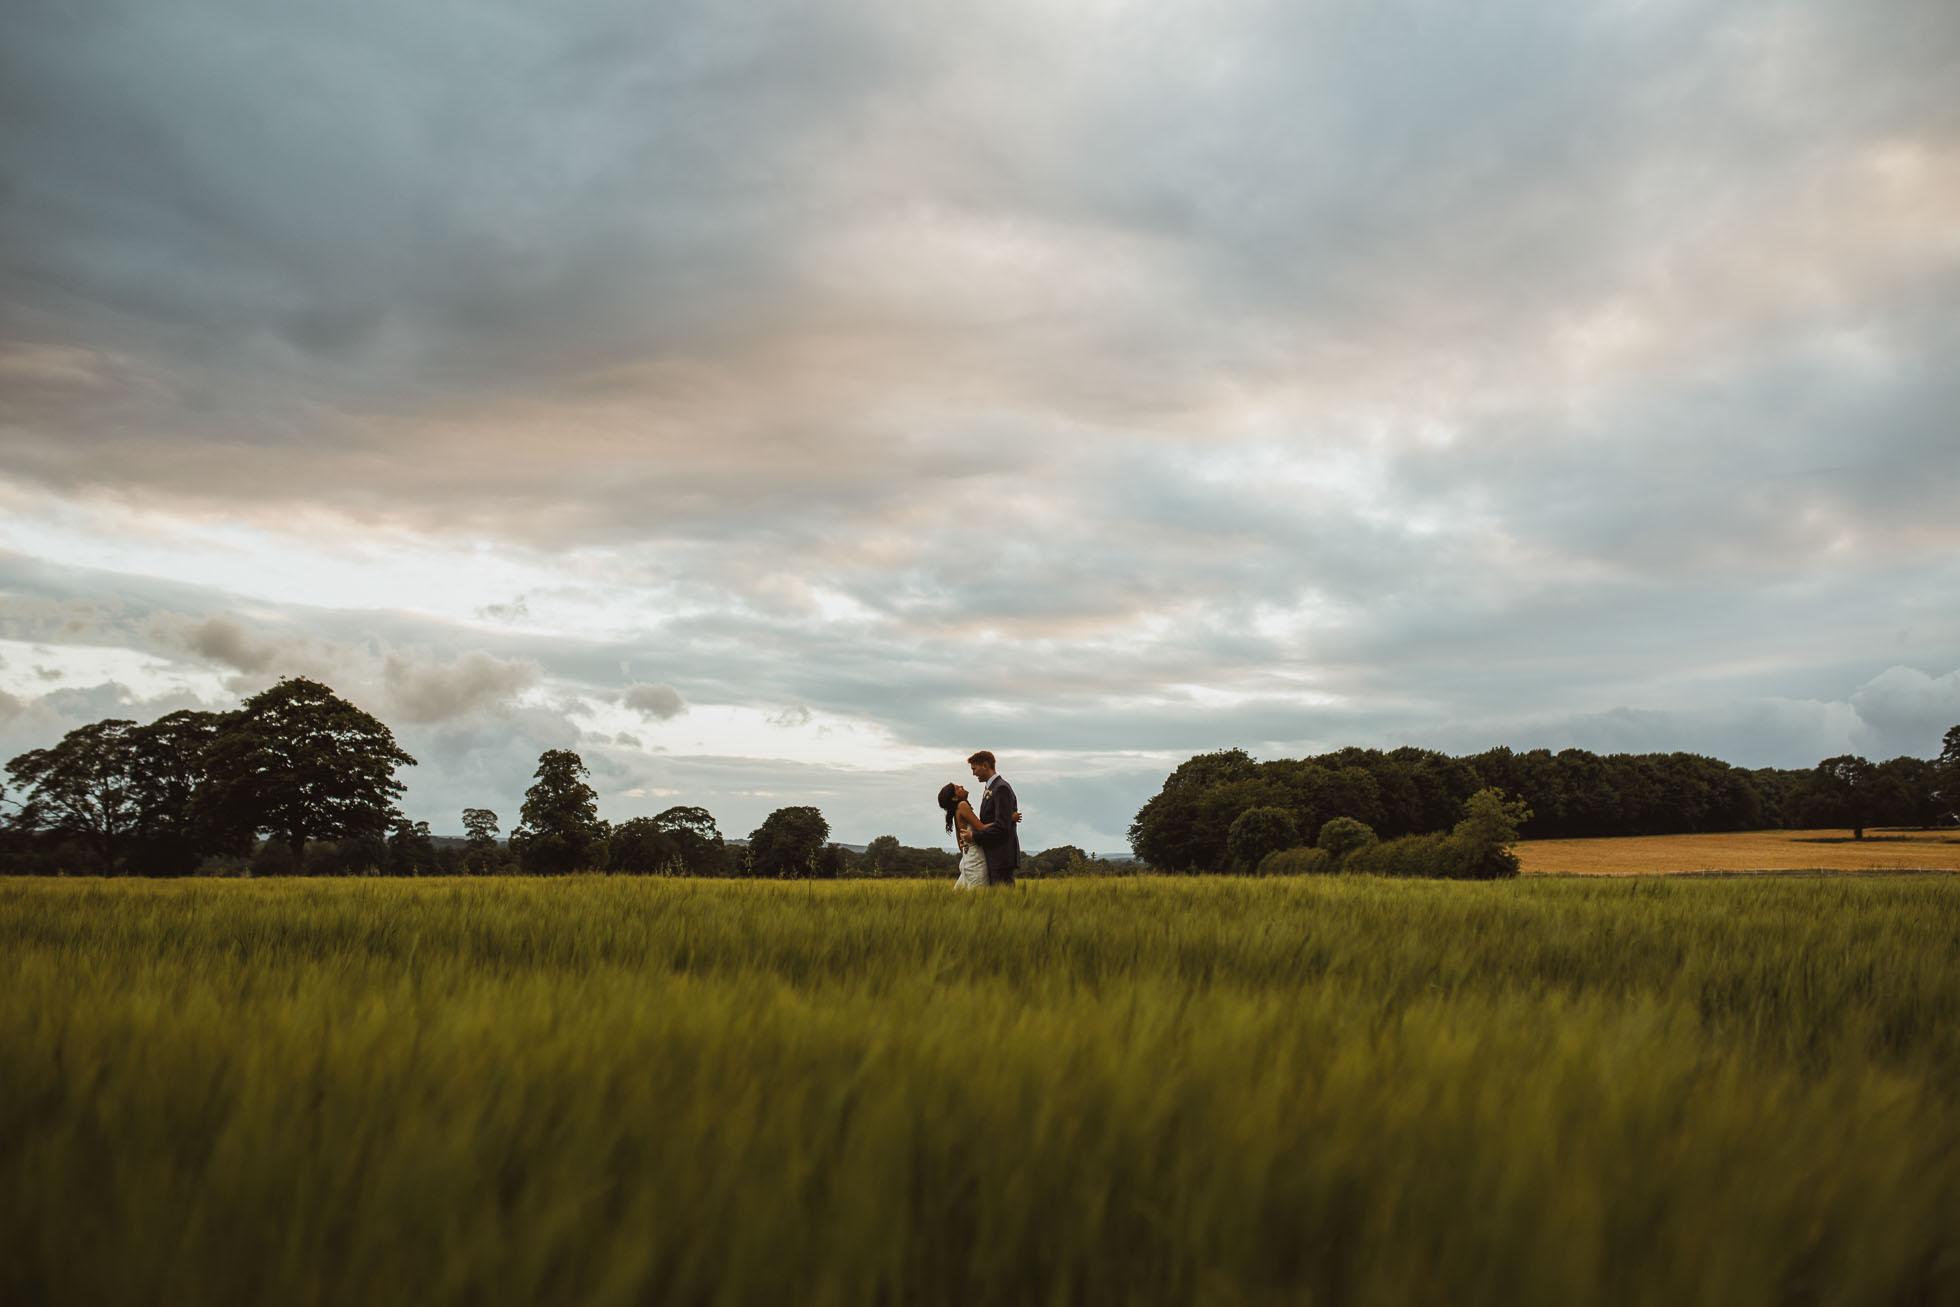 norton_conyers_wedding_photographer-83.jpg